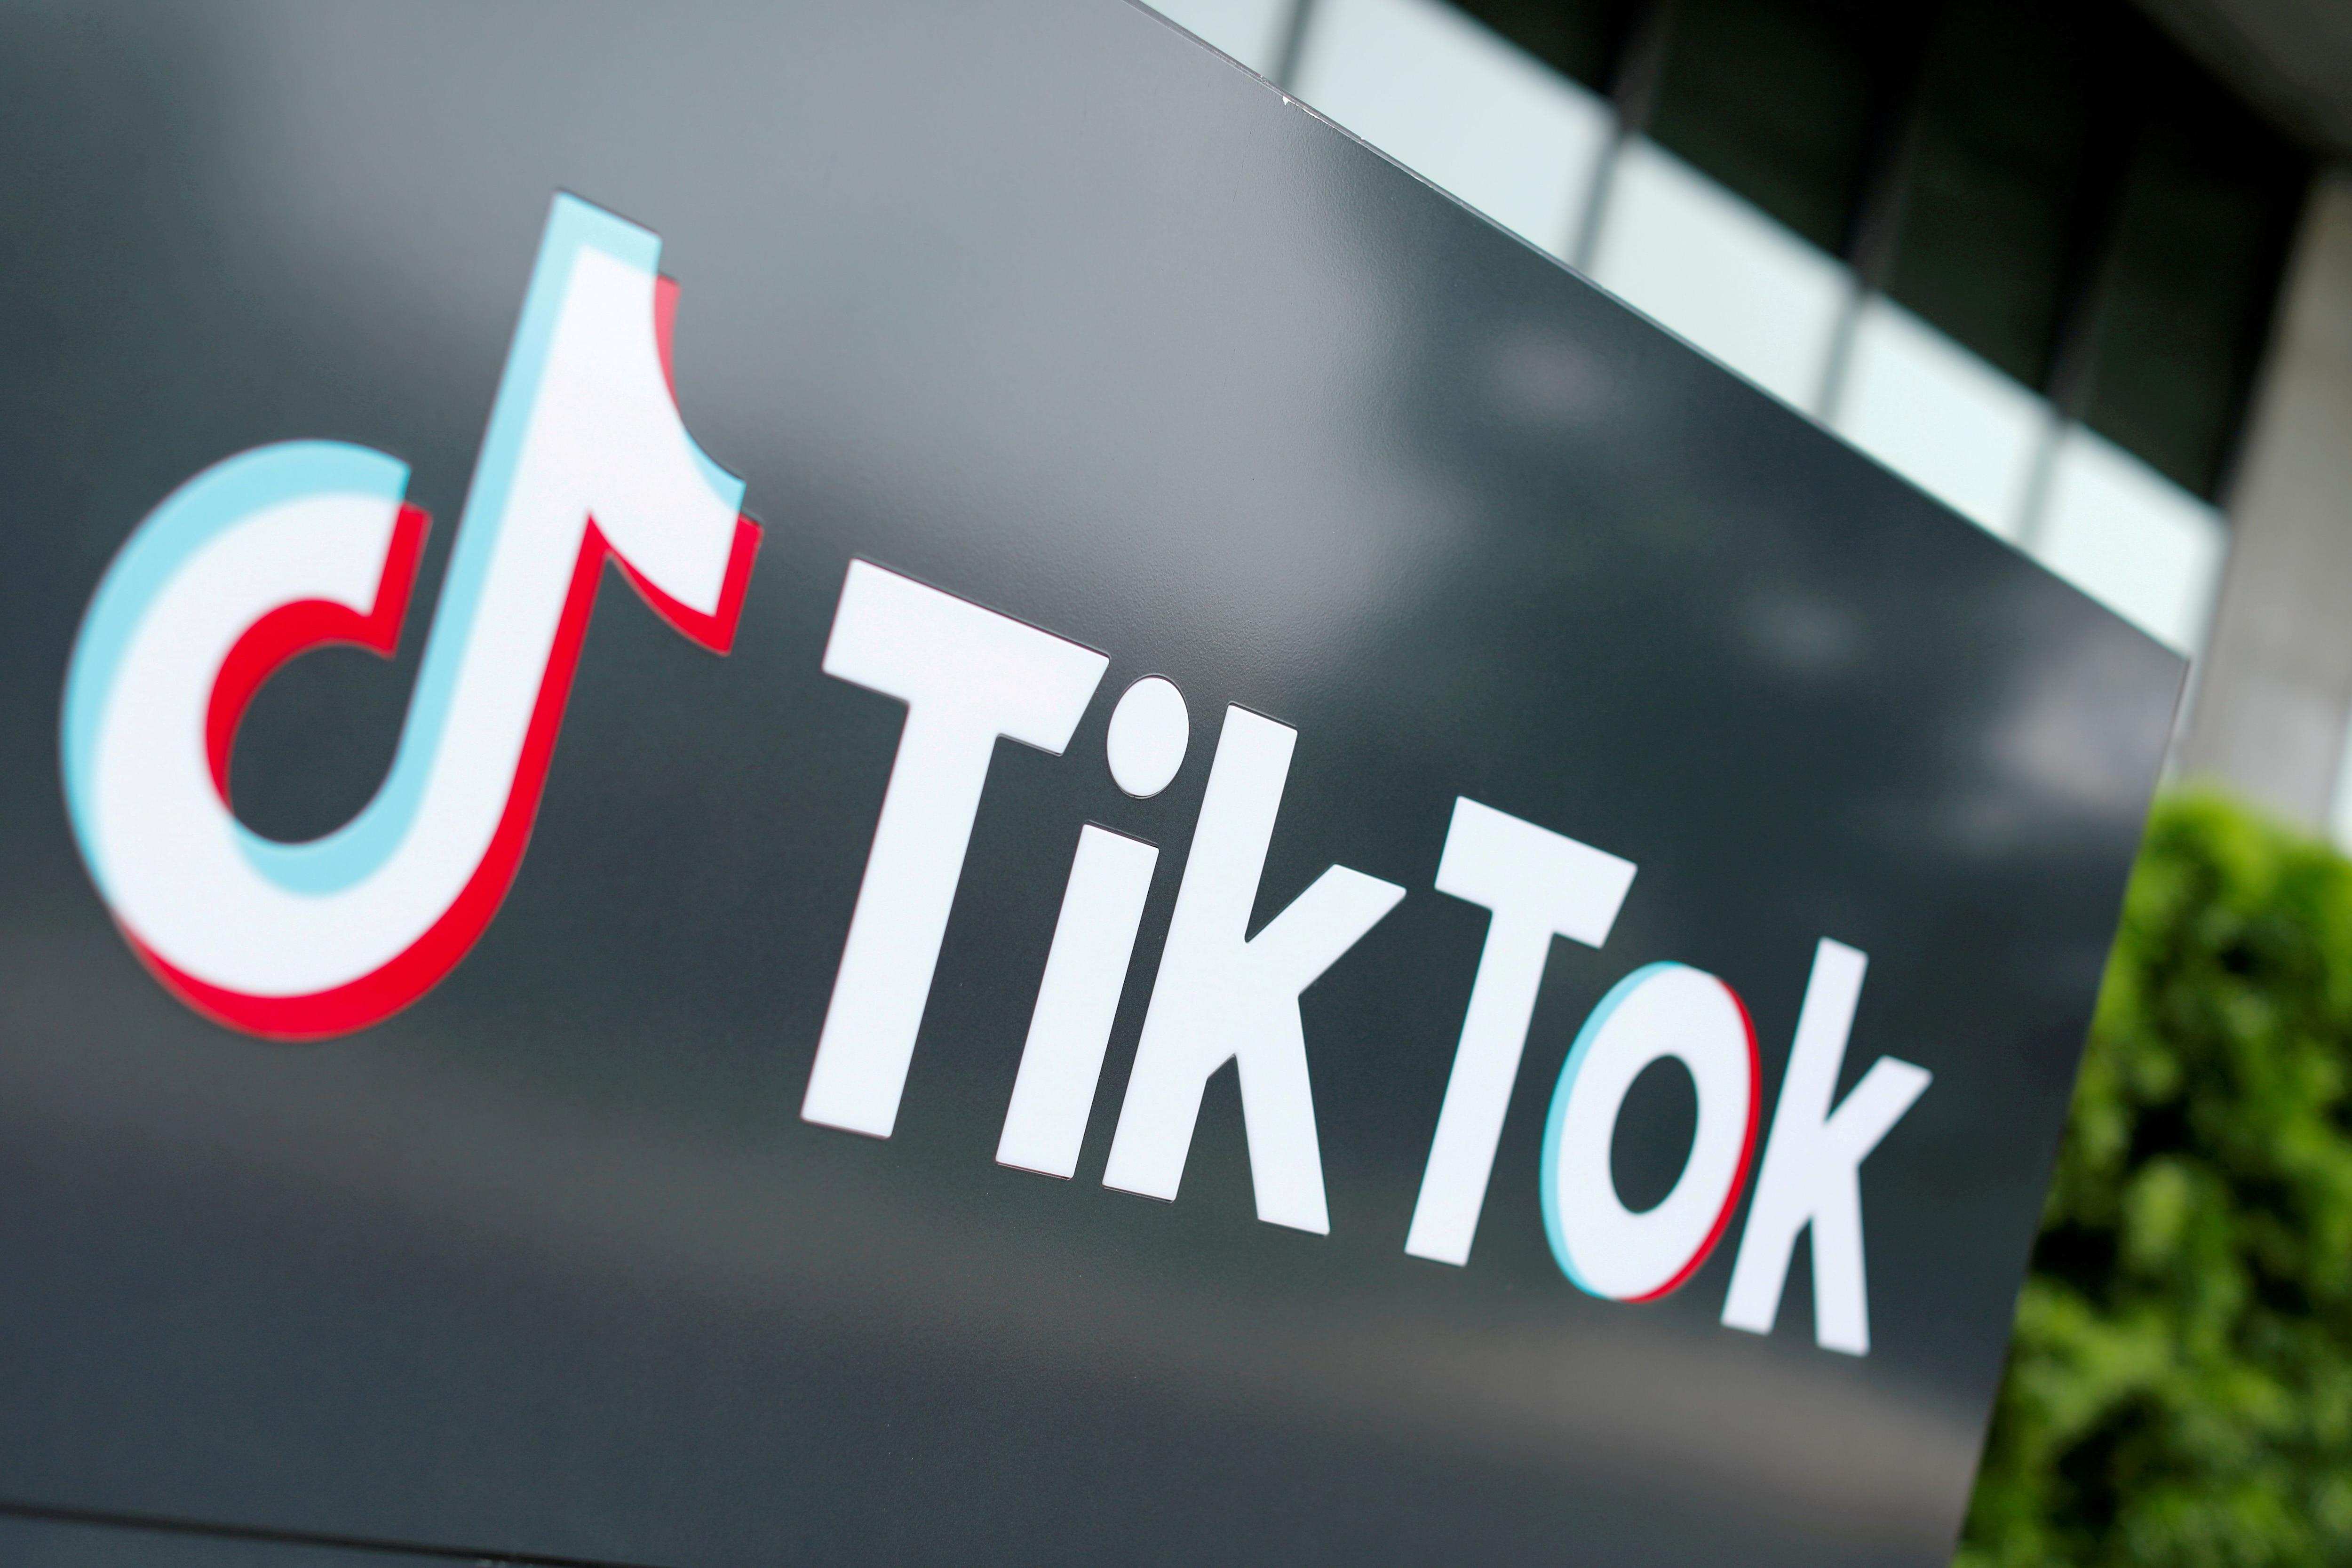 La red social china TikTok creció exponencialmente en 2020 REUTERS/Mike Blake/File Photo